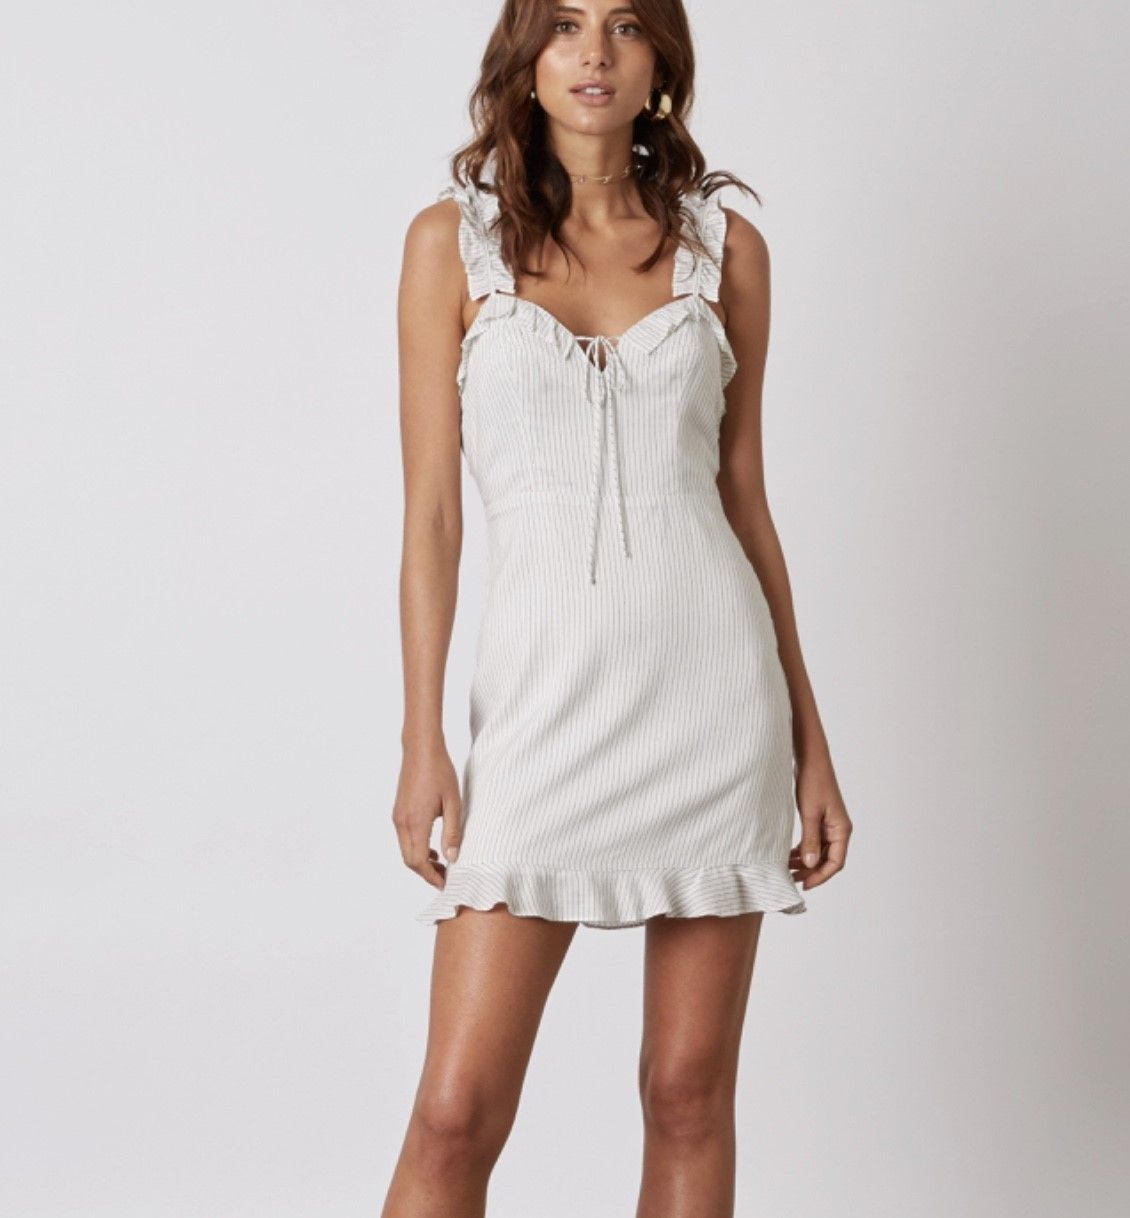 Tulum Ruffle Strap Mini Dress In White Trailing Rose Goods Vestidos Roupas Camisola